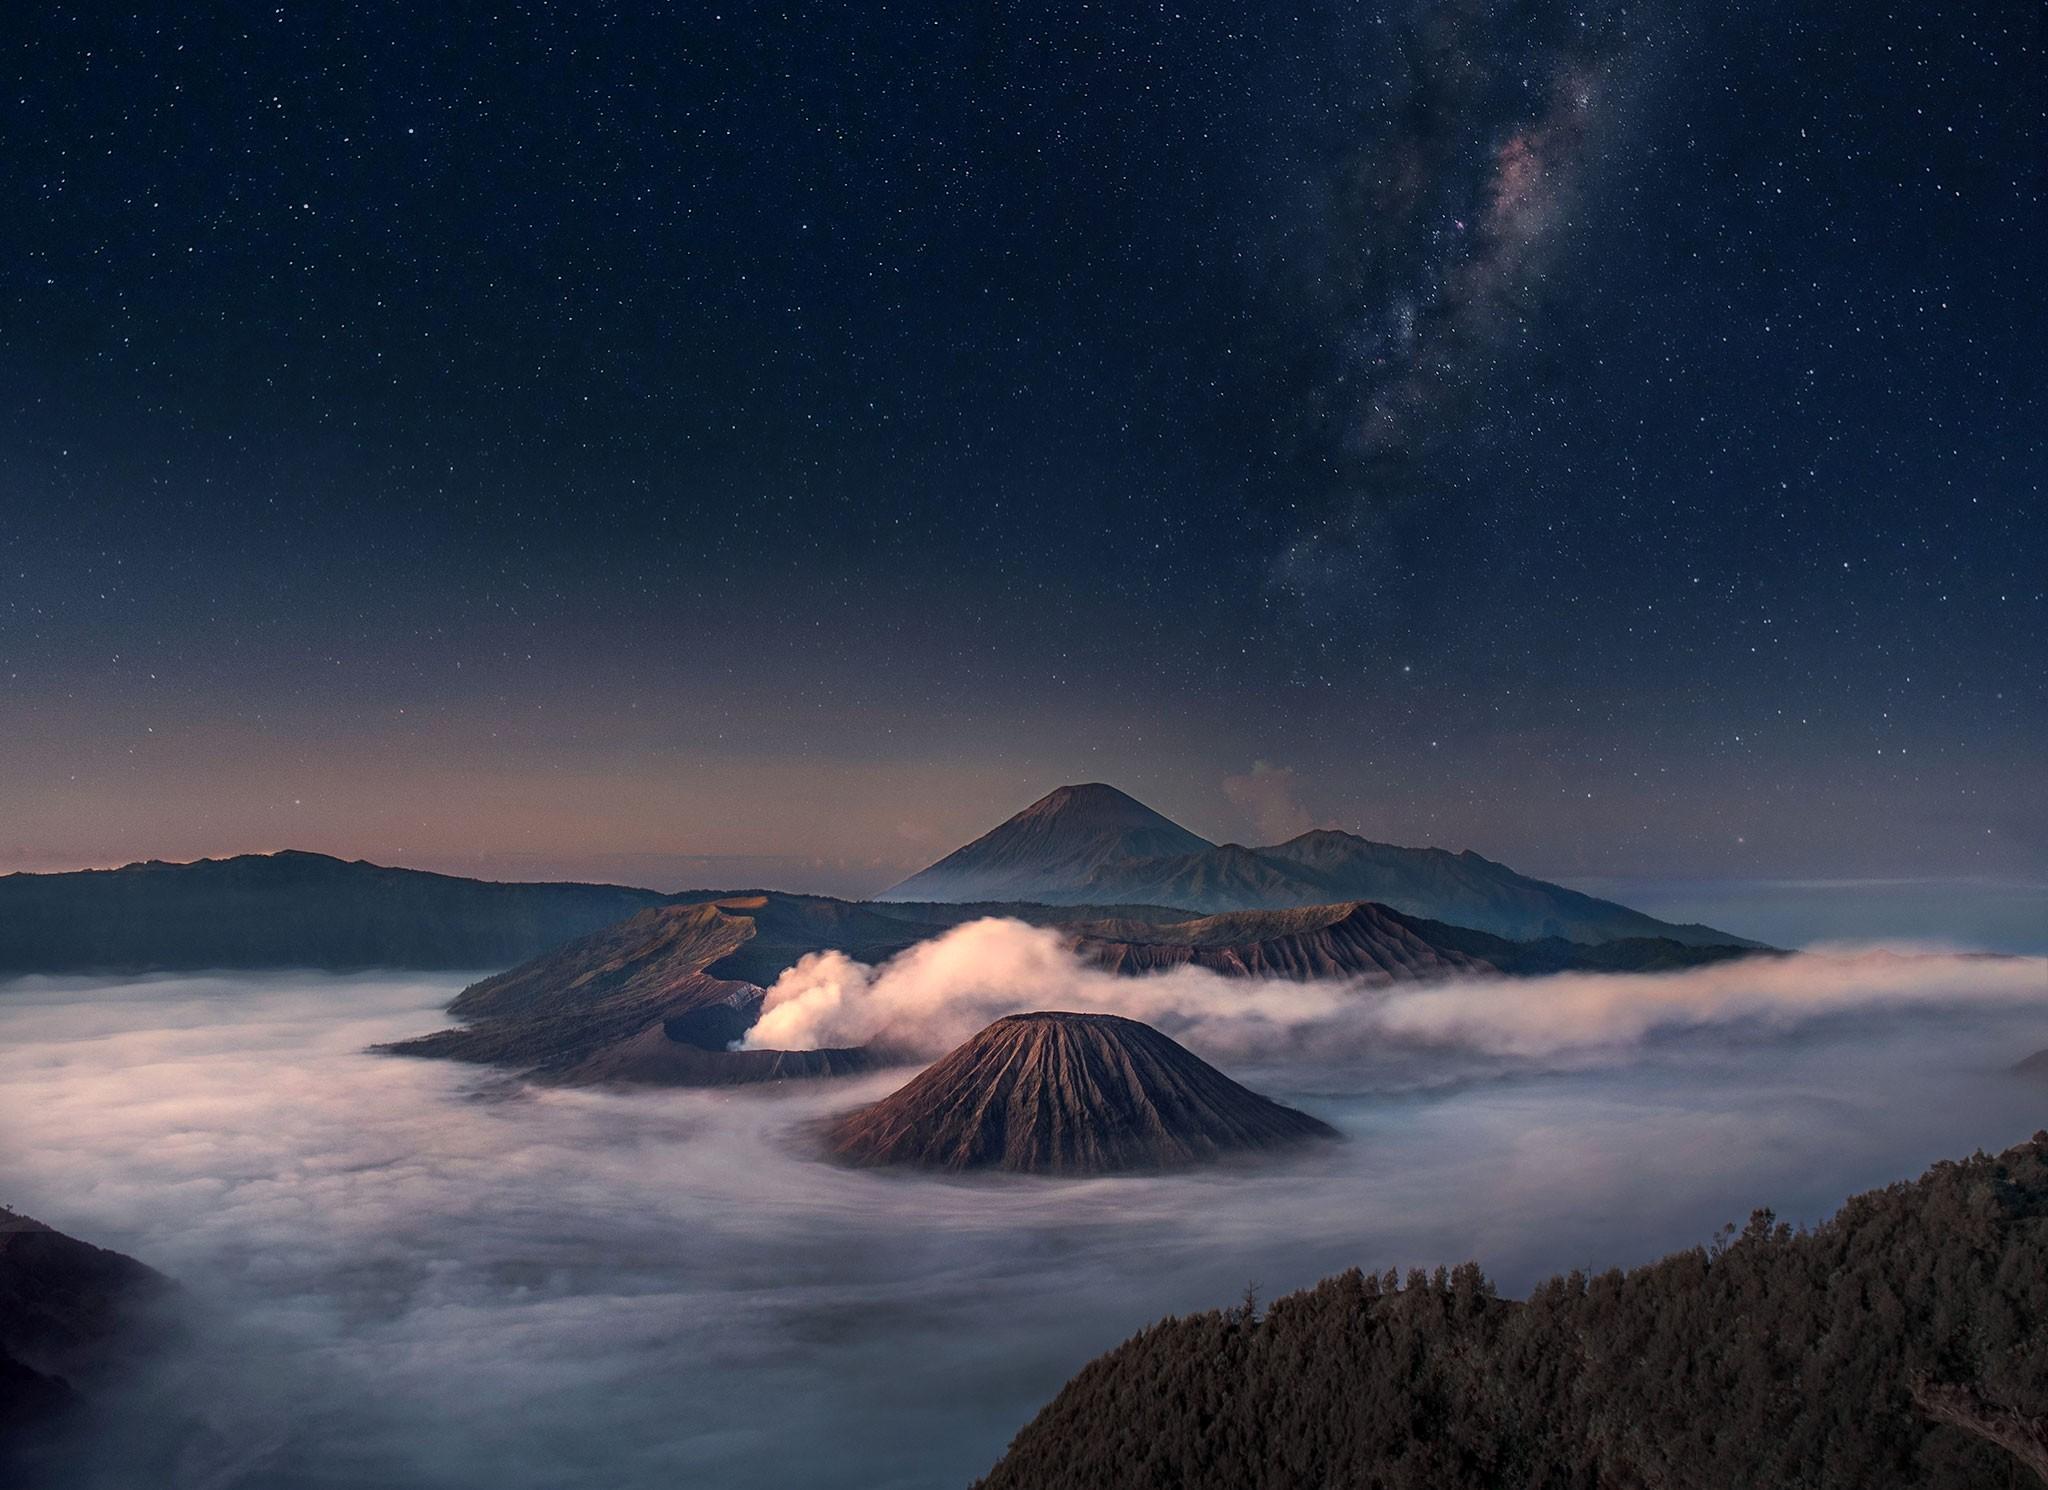 Wonderful Wallpaper Mountain Horizon - mountains-night-nature-sky-sunrise-moonlight-horizon-atmosphere-dusk-Indonesia-mountain-dawn-star-atmospheric-phenomenon-outer-space-astronomical-object-geological-phenomenon-143930  Best Photo Reference_93861.jpg